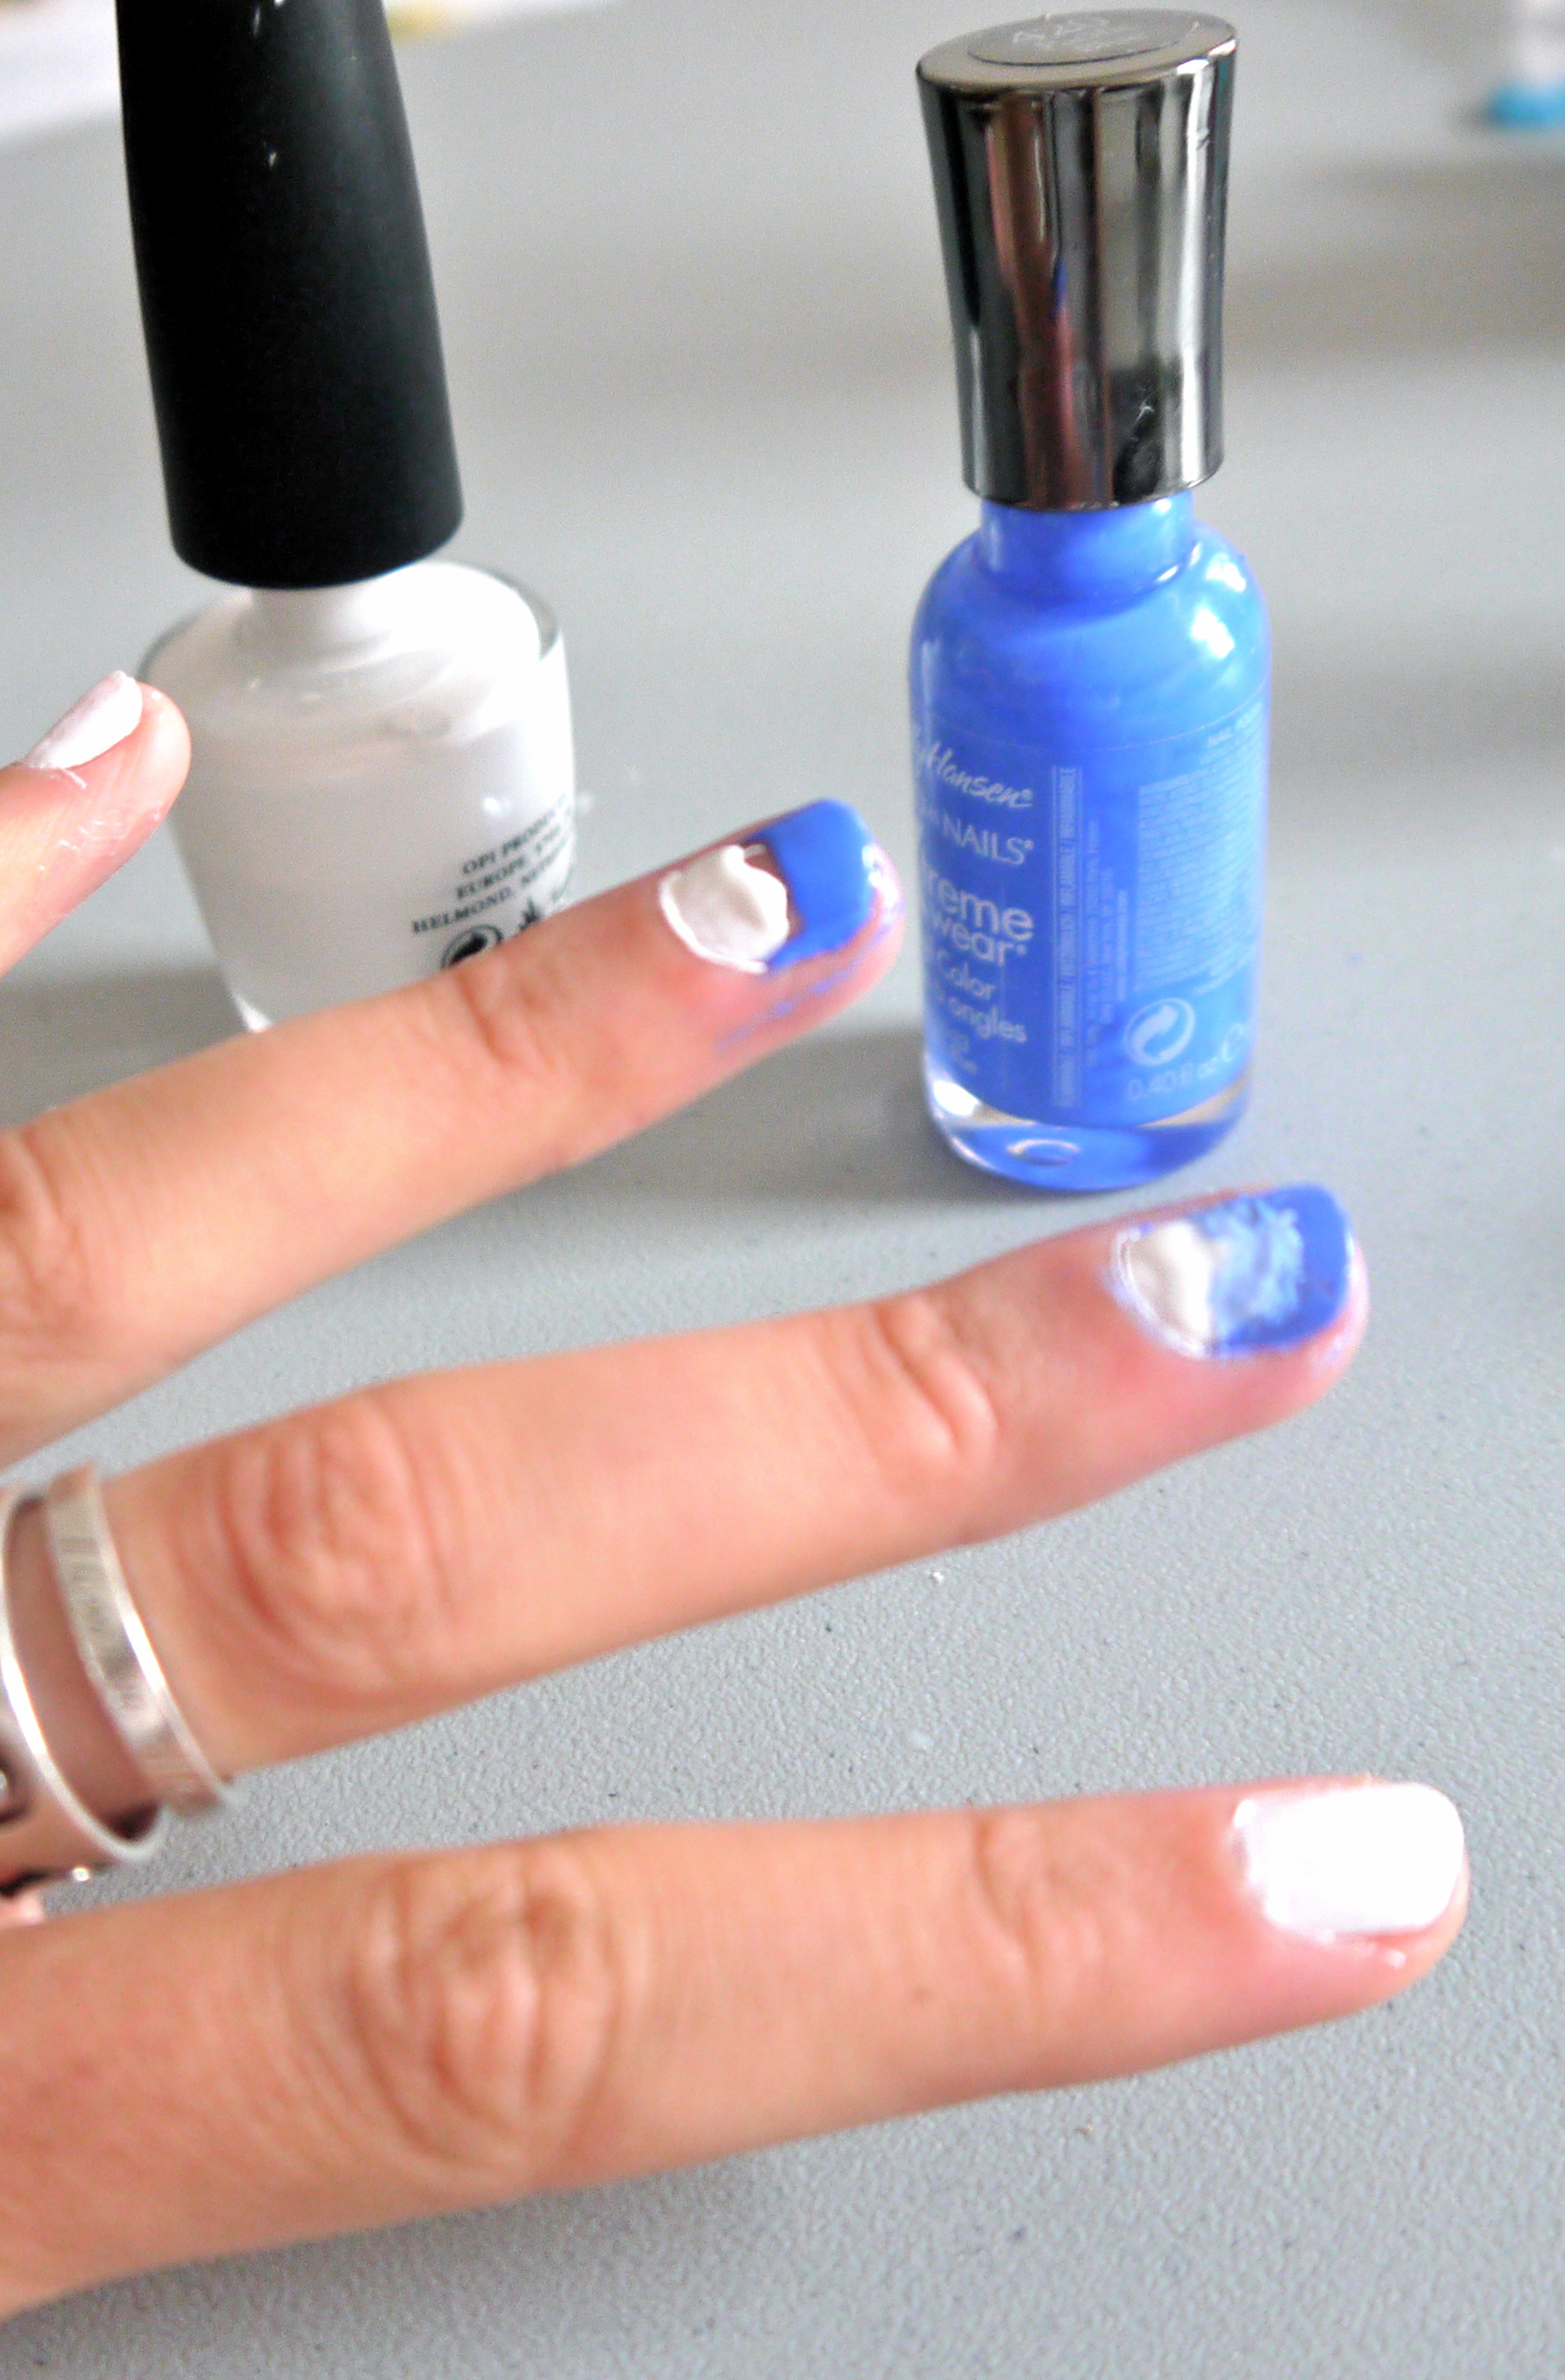 Diy ombre nail polish pumps iron using solutioingenieria Images